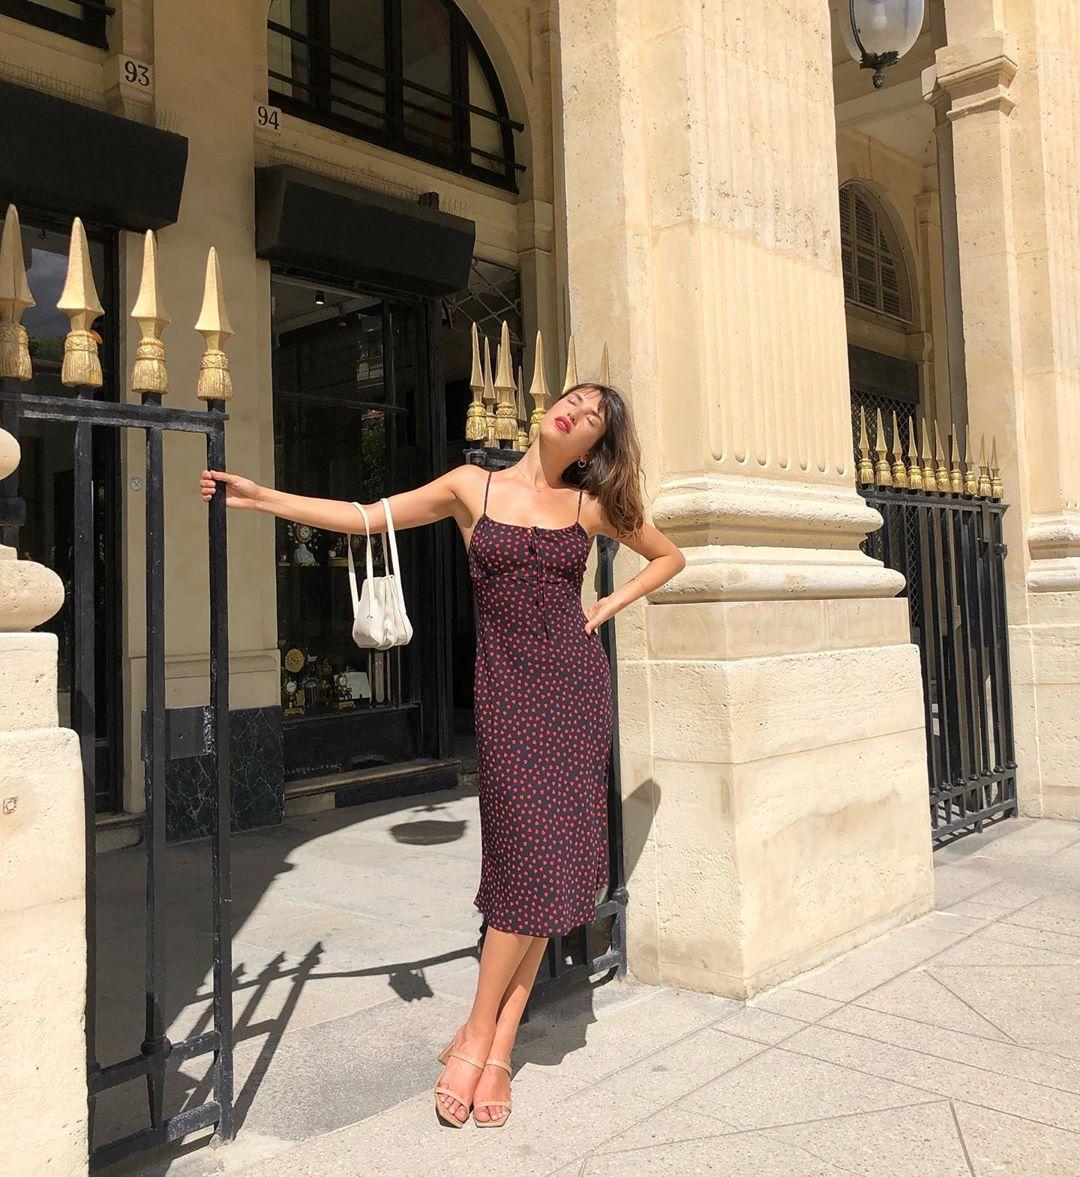 jeanne damas mặc đầm slip dress mang giày sandal nữ mũi vuông